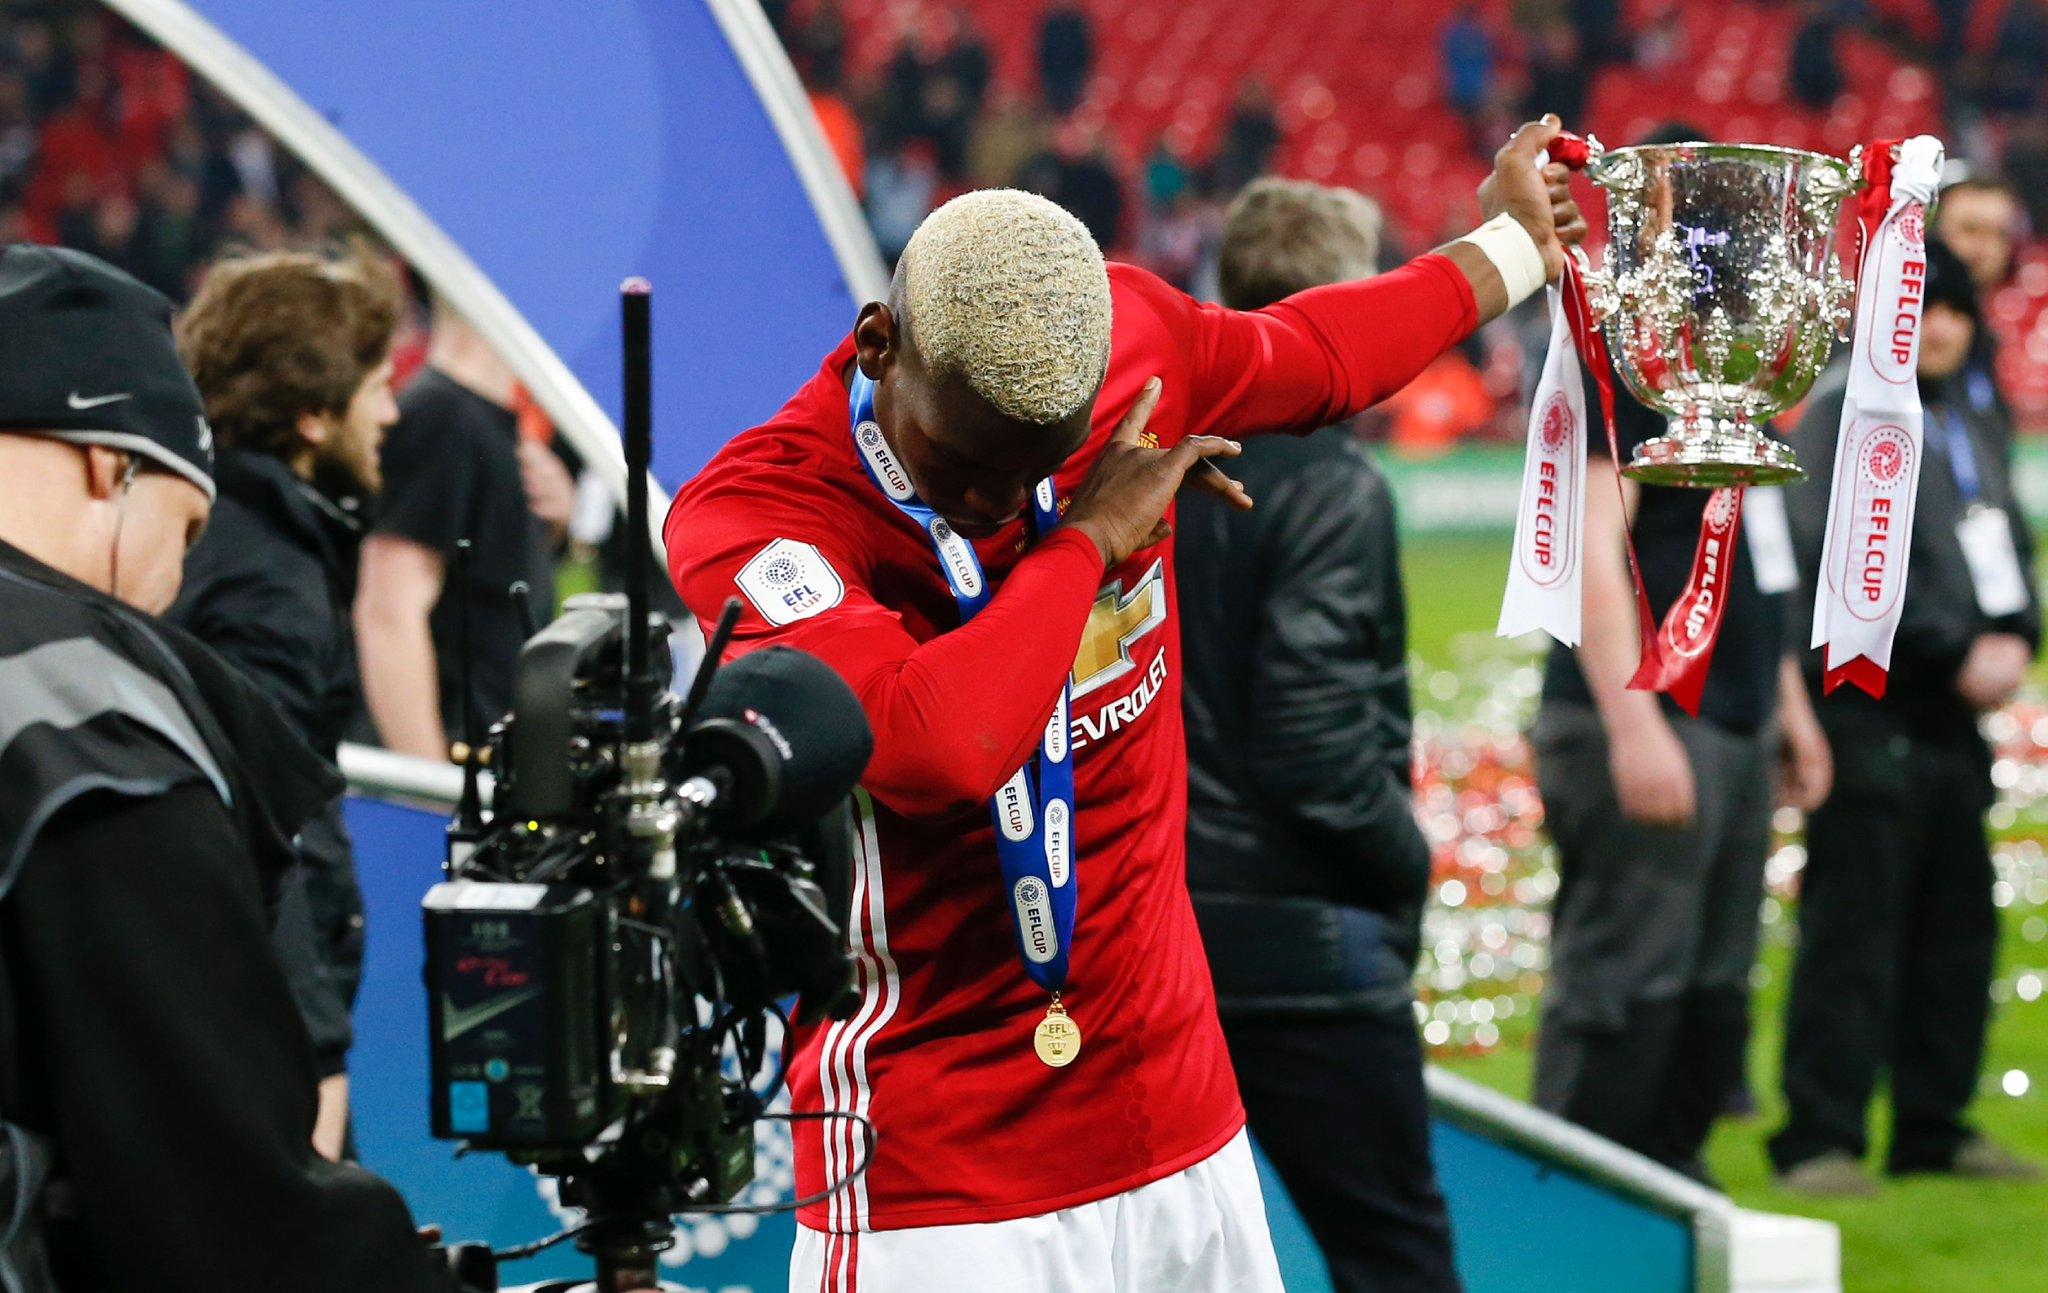 Happy birthday to Man United star Paul Pogba who turns 24 today